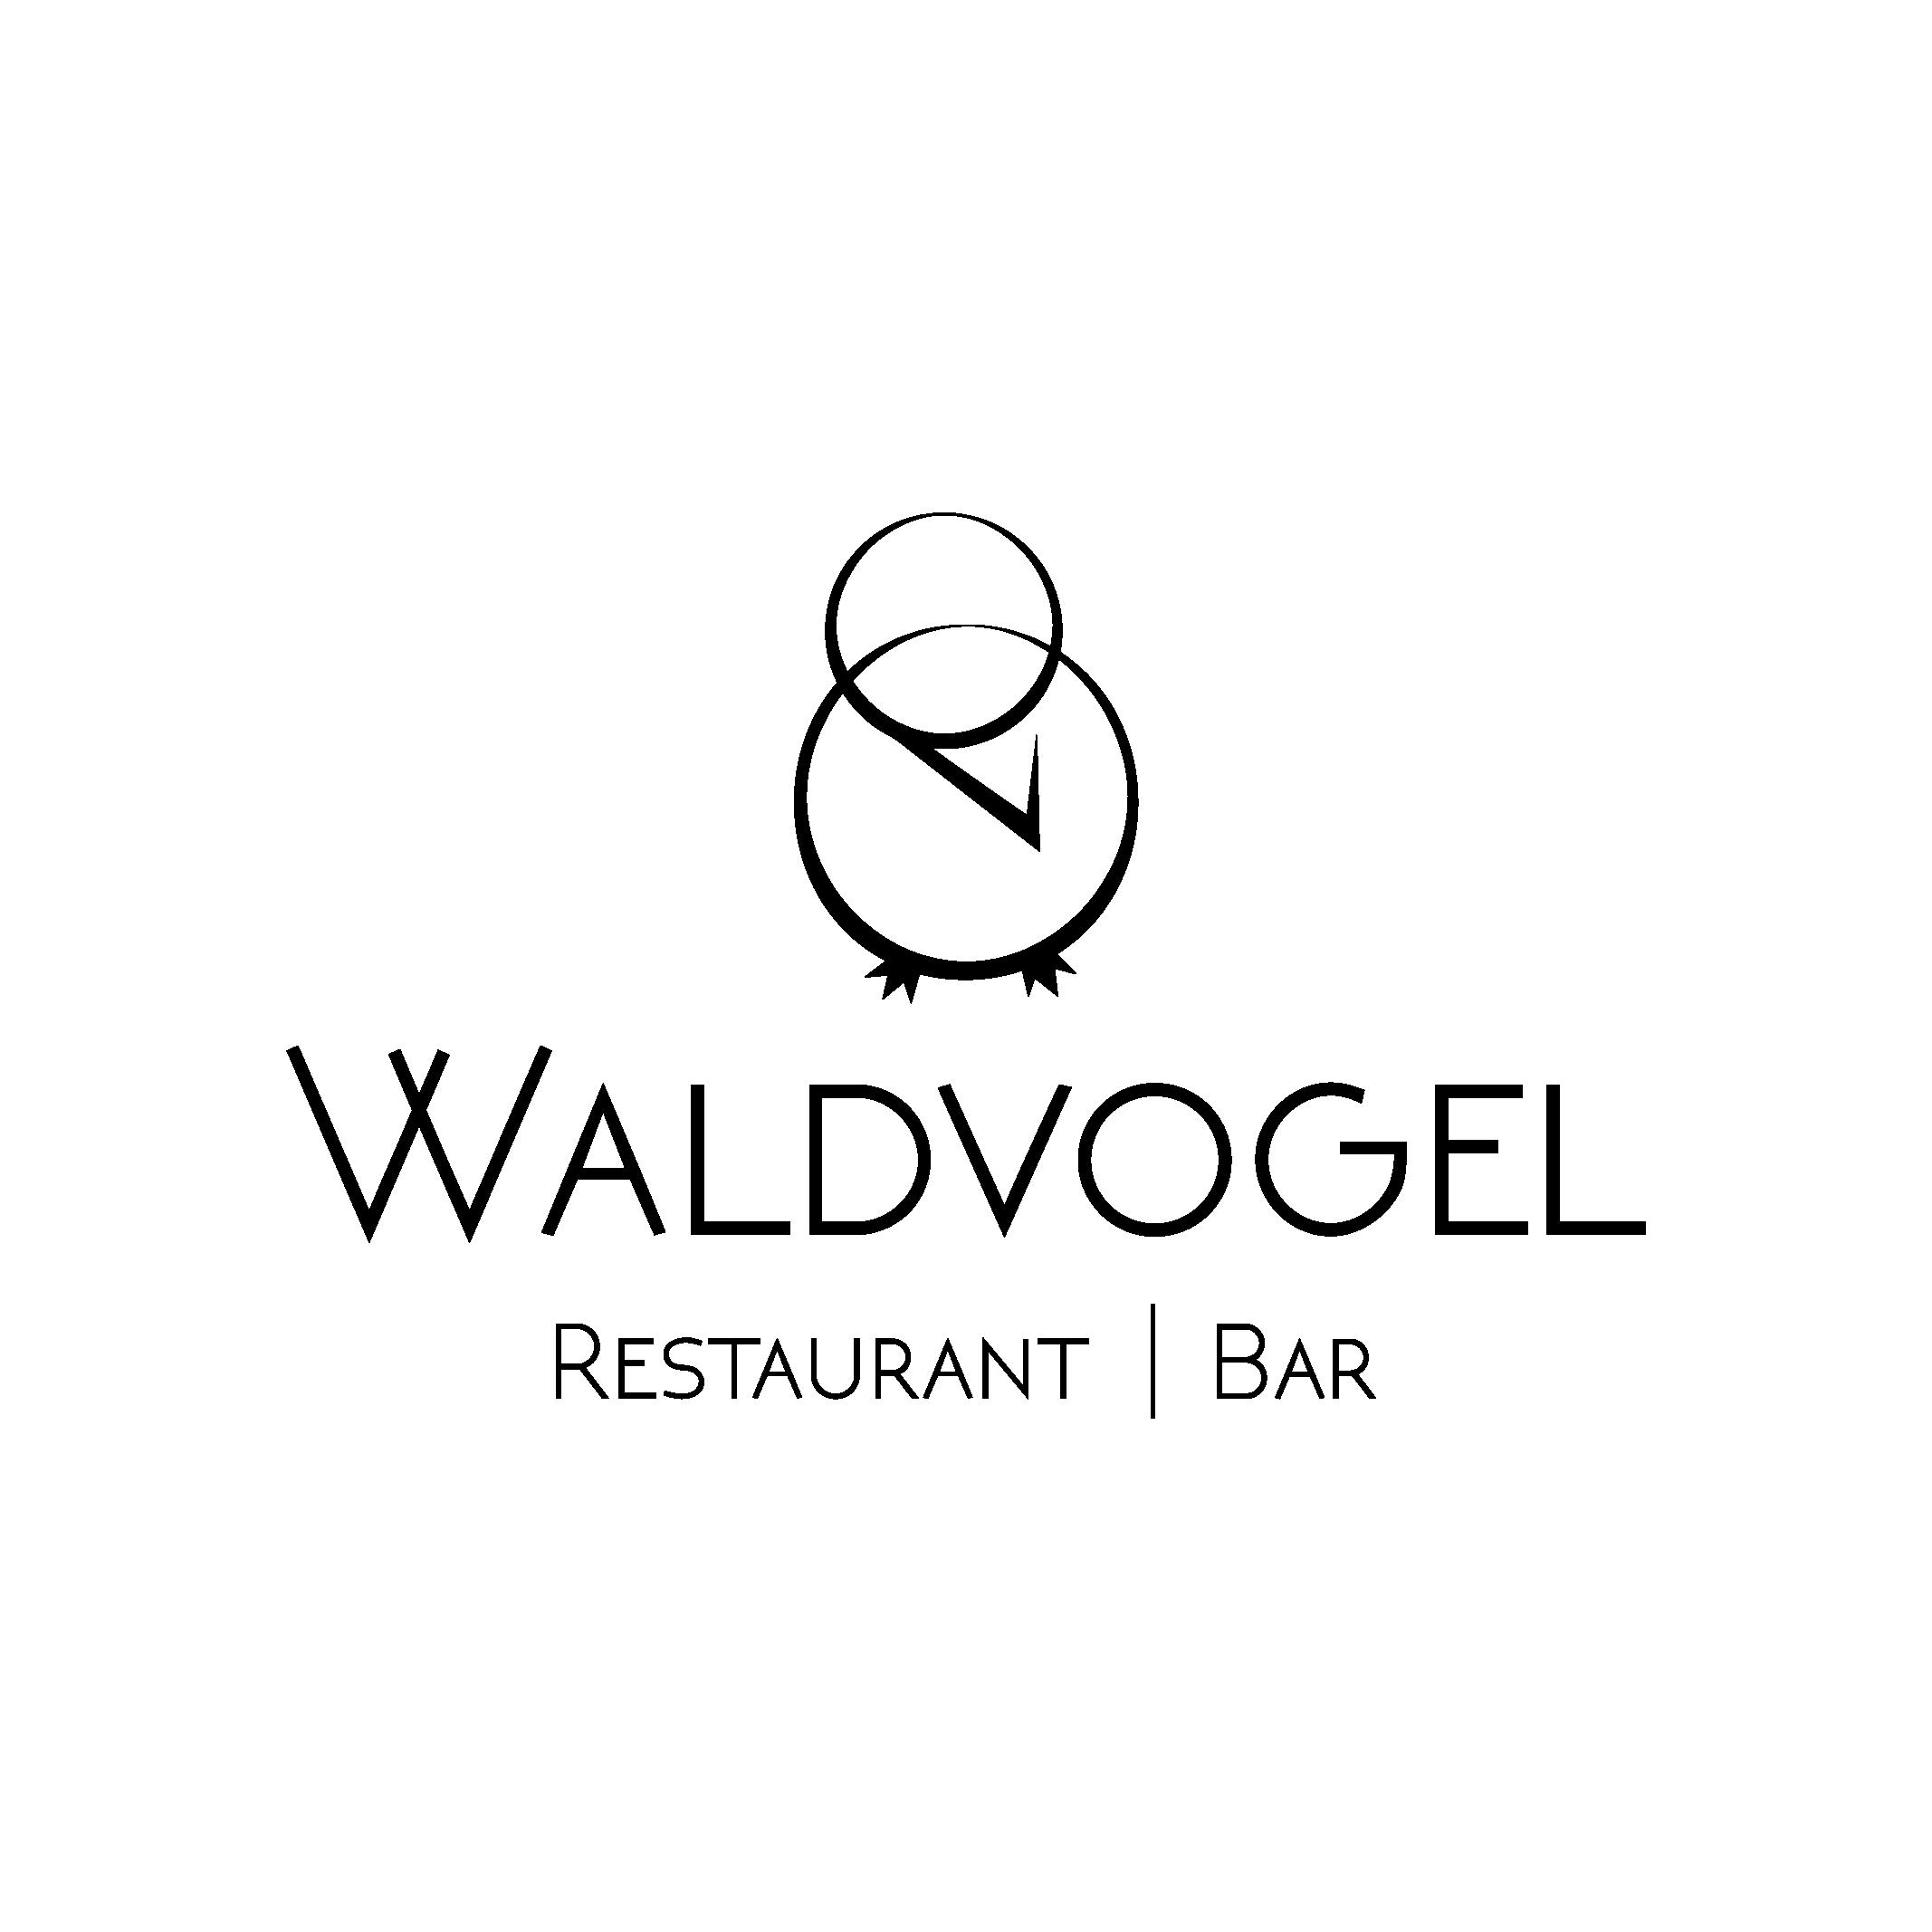 https://www.influxmediahouse.com/wp-content/uploads/2020/01/Logo_WV-colour.png